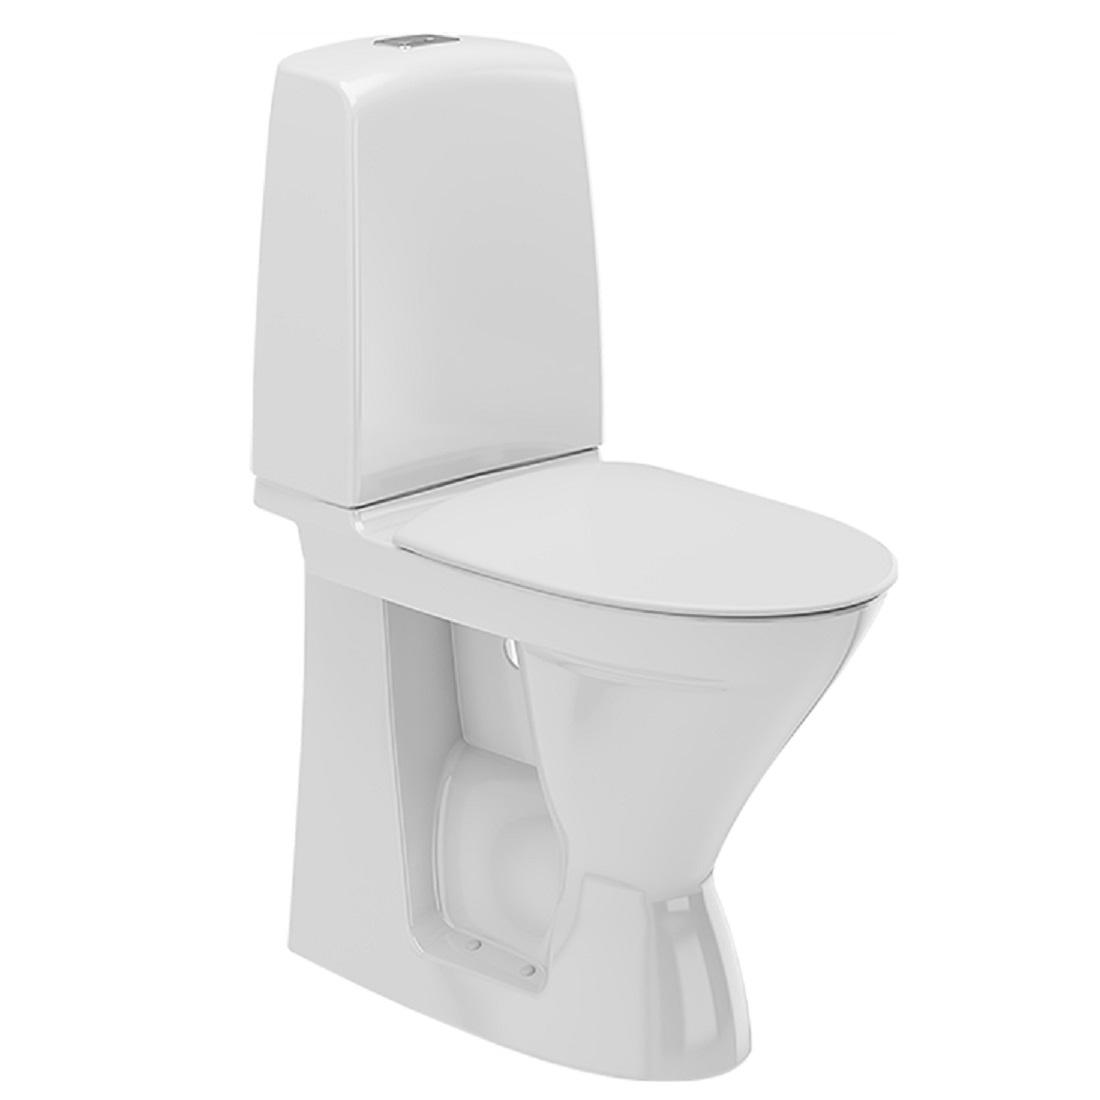 Toalettstol Ifö Spira 6261 Rimfree Hög Modell